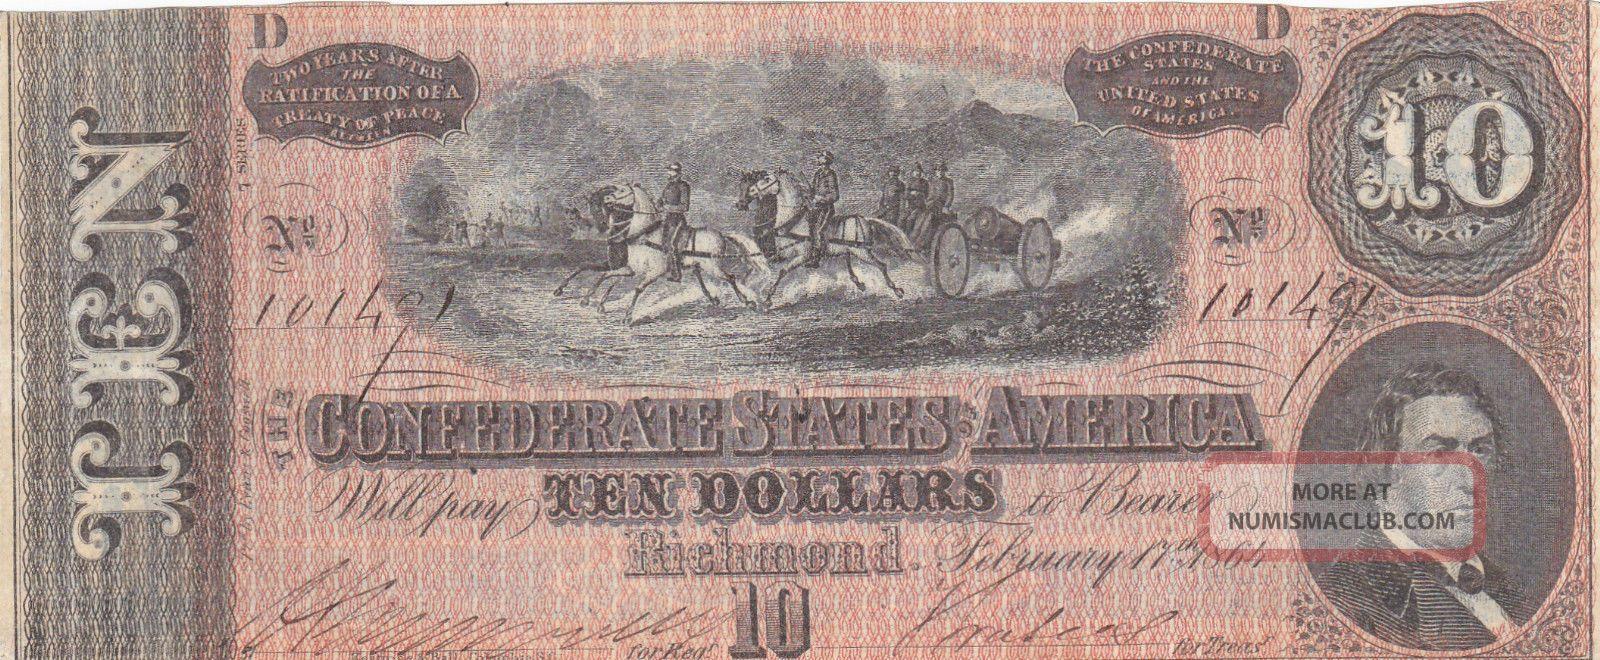 1864 Confederate States Ten Dollar $10 Note; Richmond No 10149 Higher Grade Paper Money: US photo